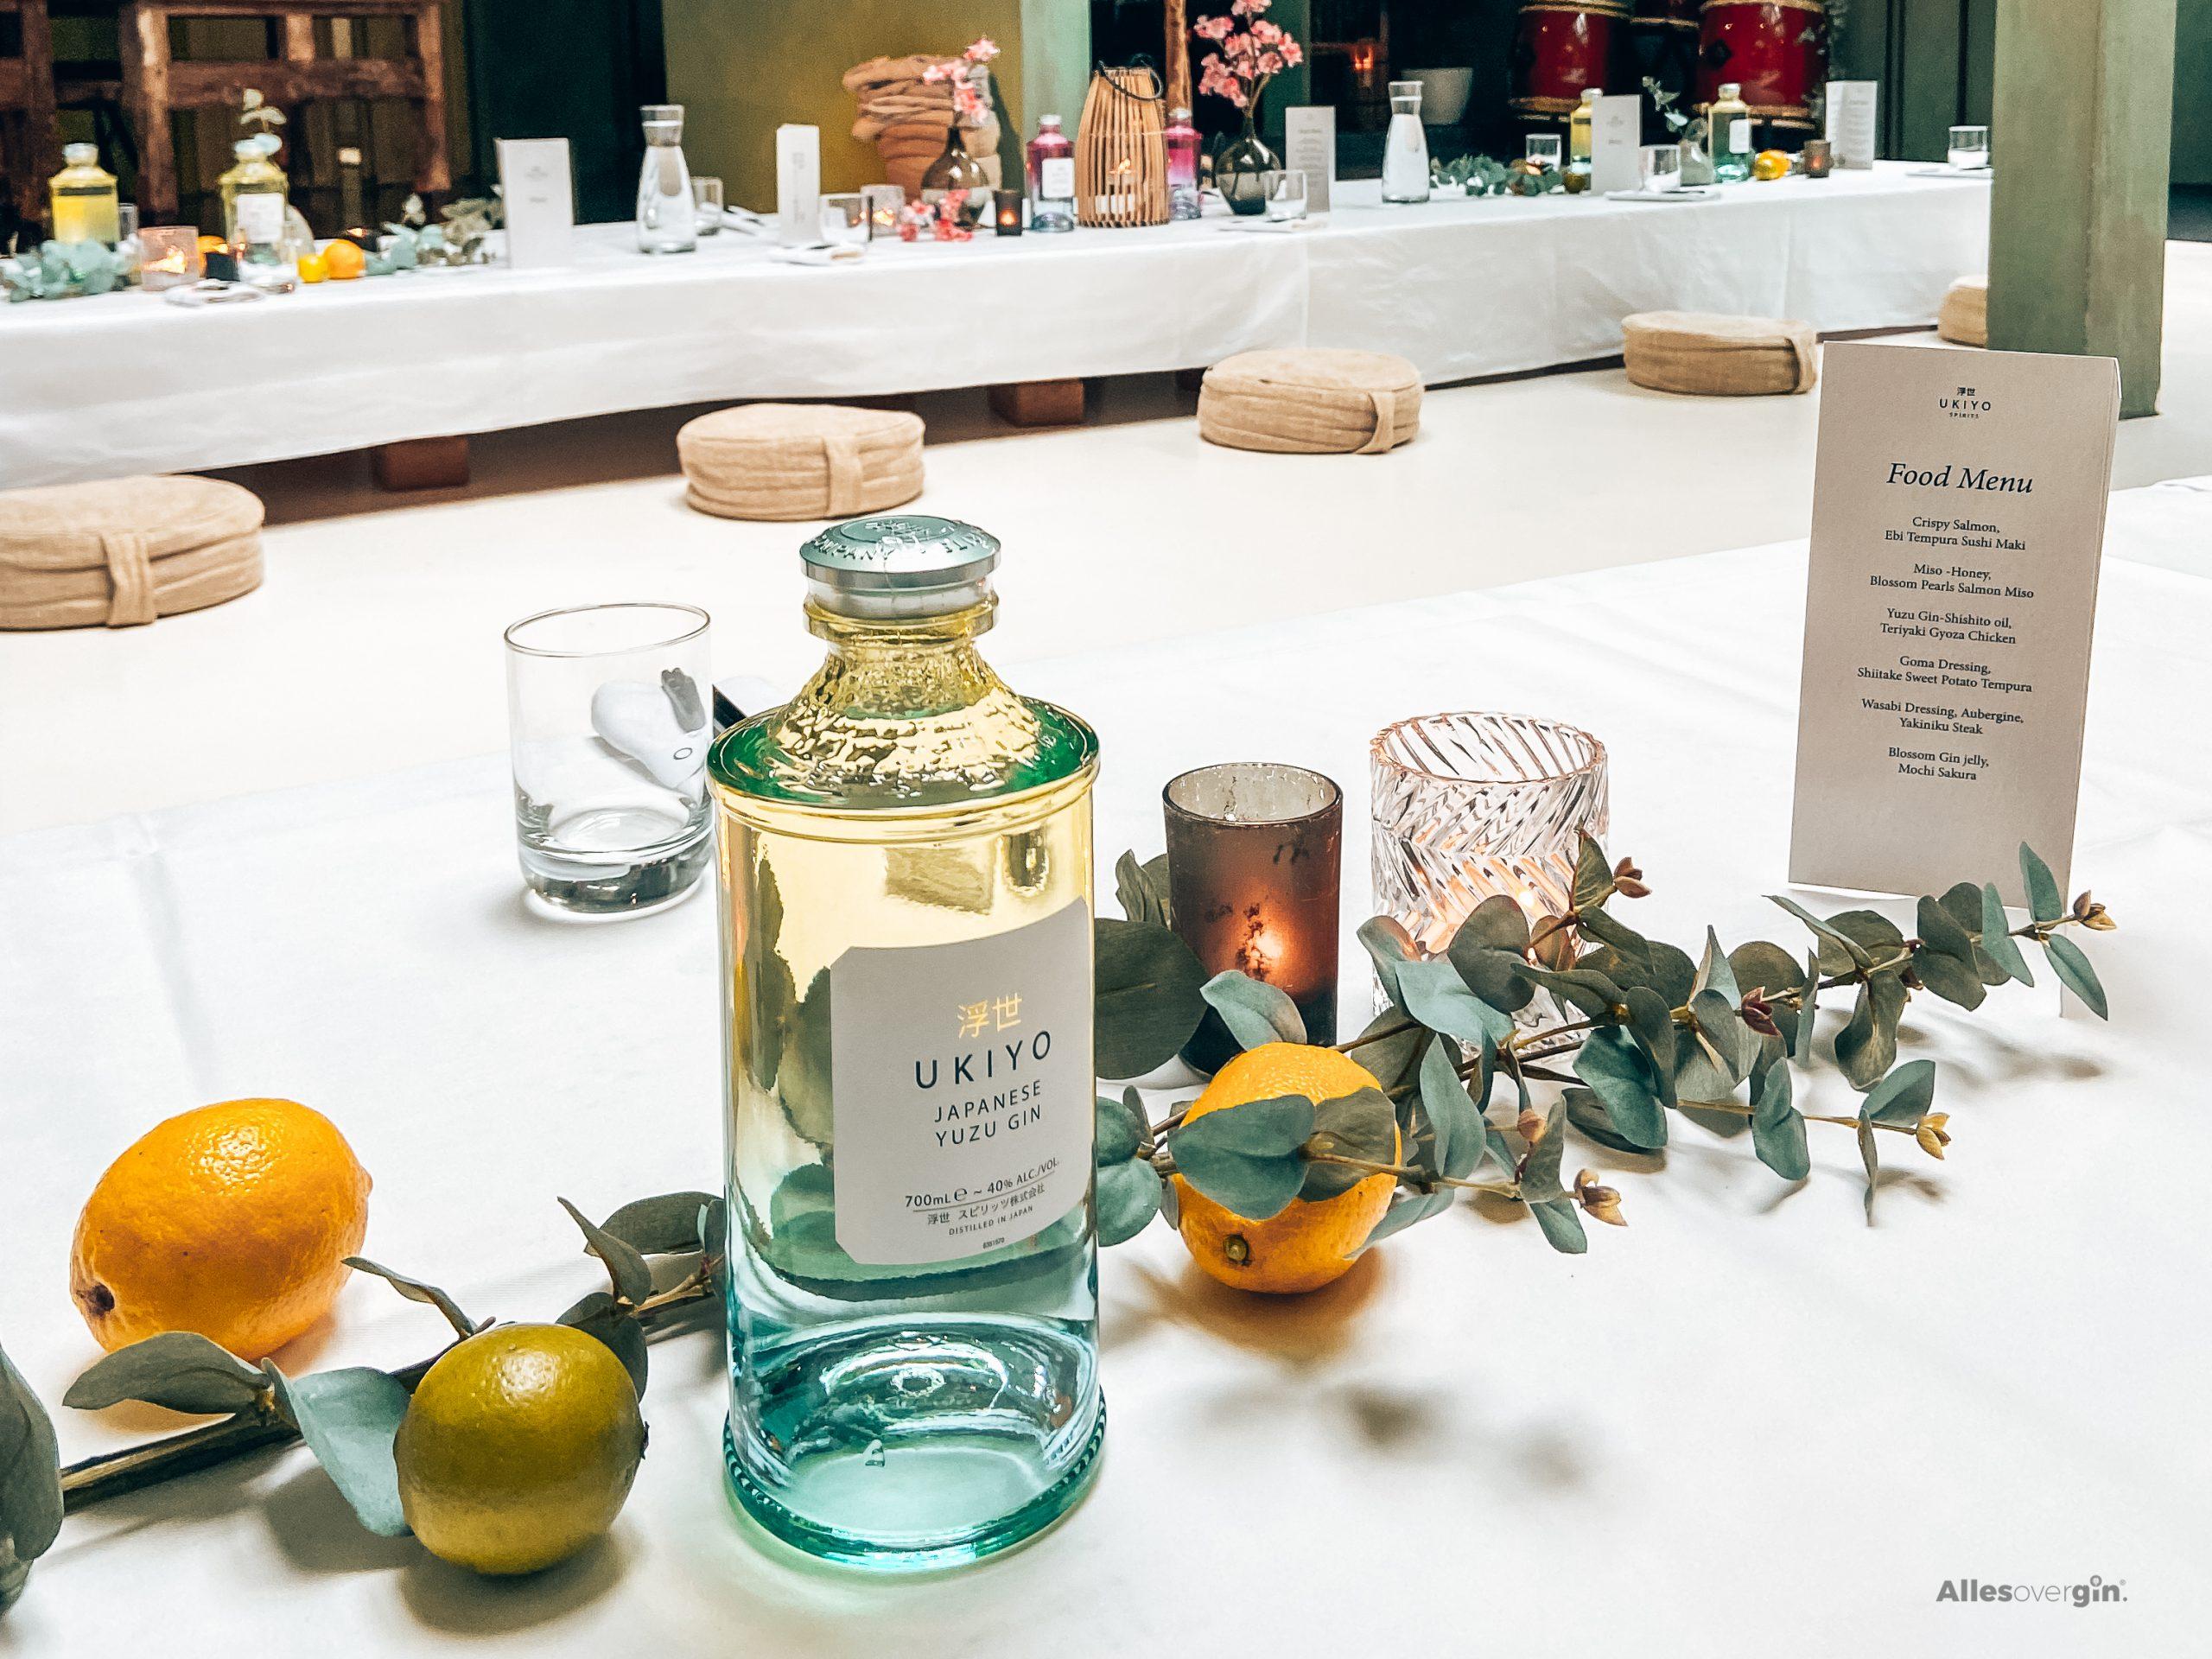 Ukiyo Gin, lancering Blossom Gin en Yuzu Gin, Amsterdam, The White Room, Alles over gin.